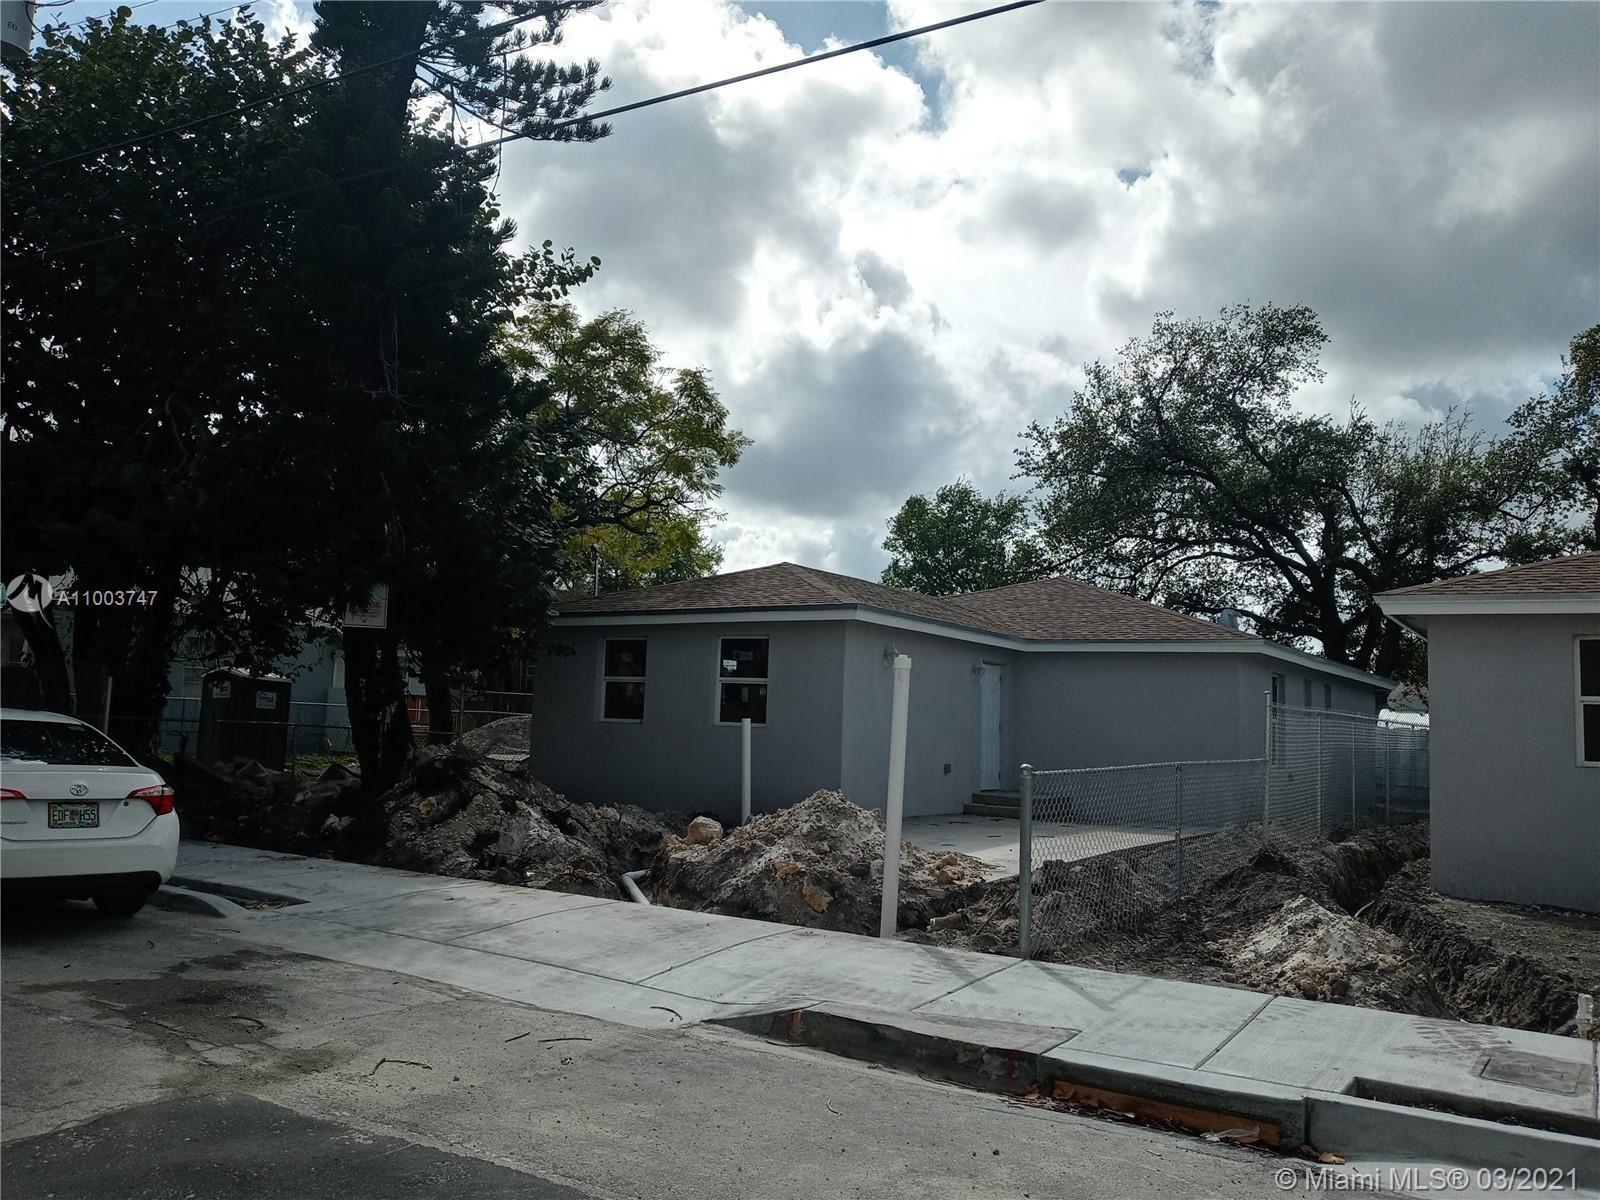 6828 NW 5 PL, Miami, FL 33150 - #: A11003747